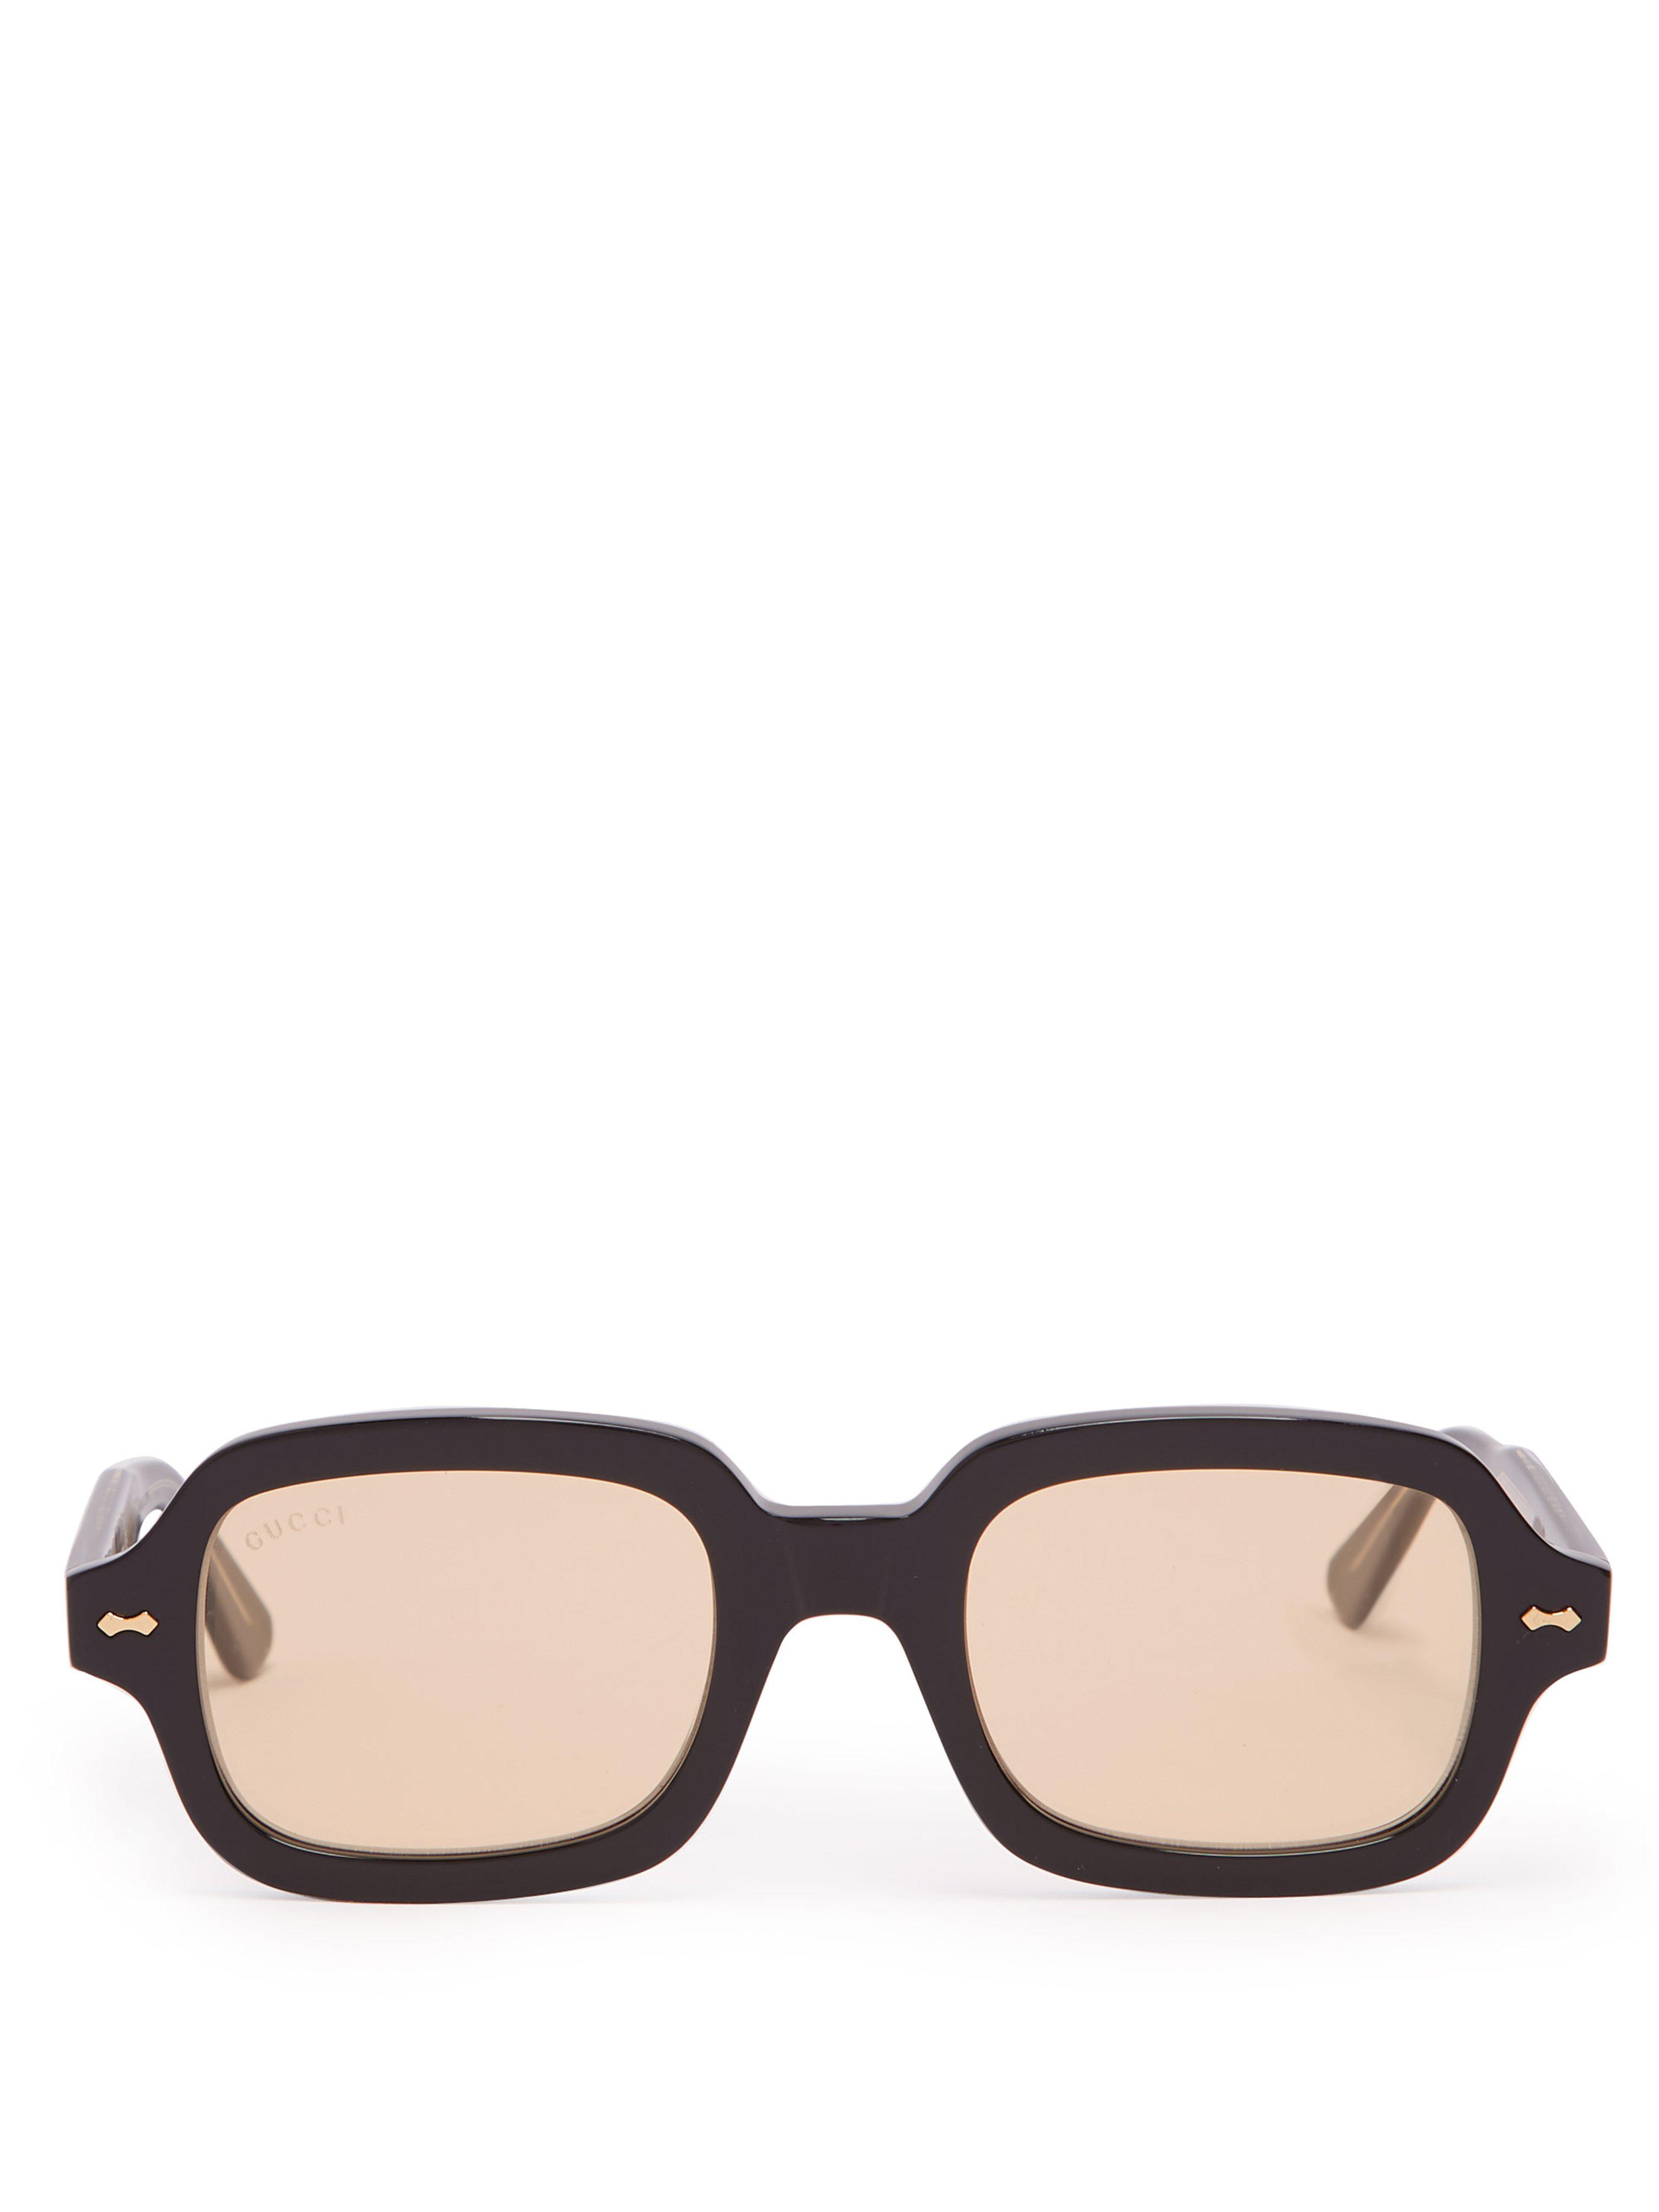 d97ca6c2479 Gucci - Black Round Square Frame Acetate Sunglasses for Men - Lyst. View  fullscreen